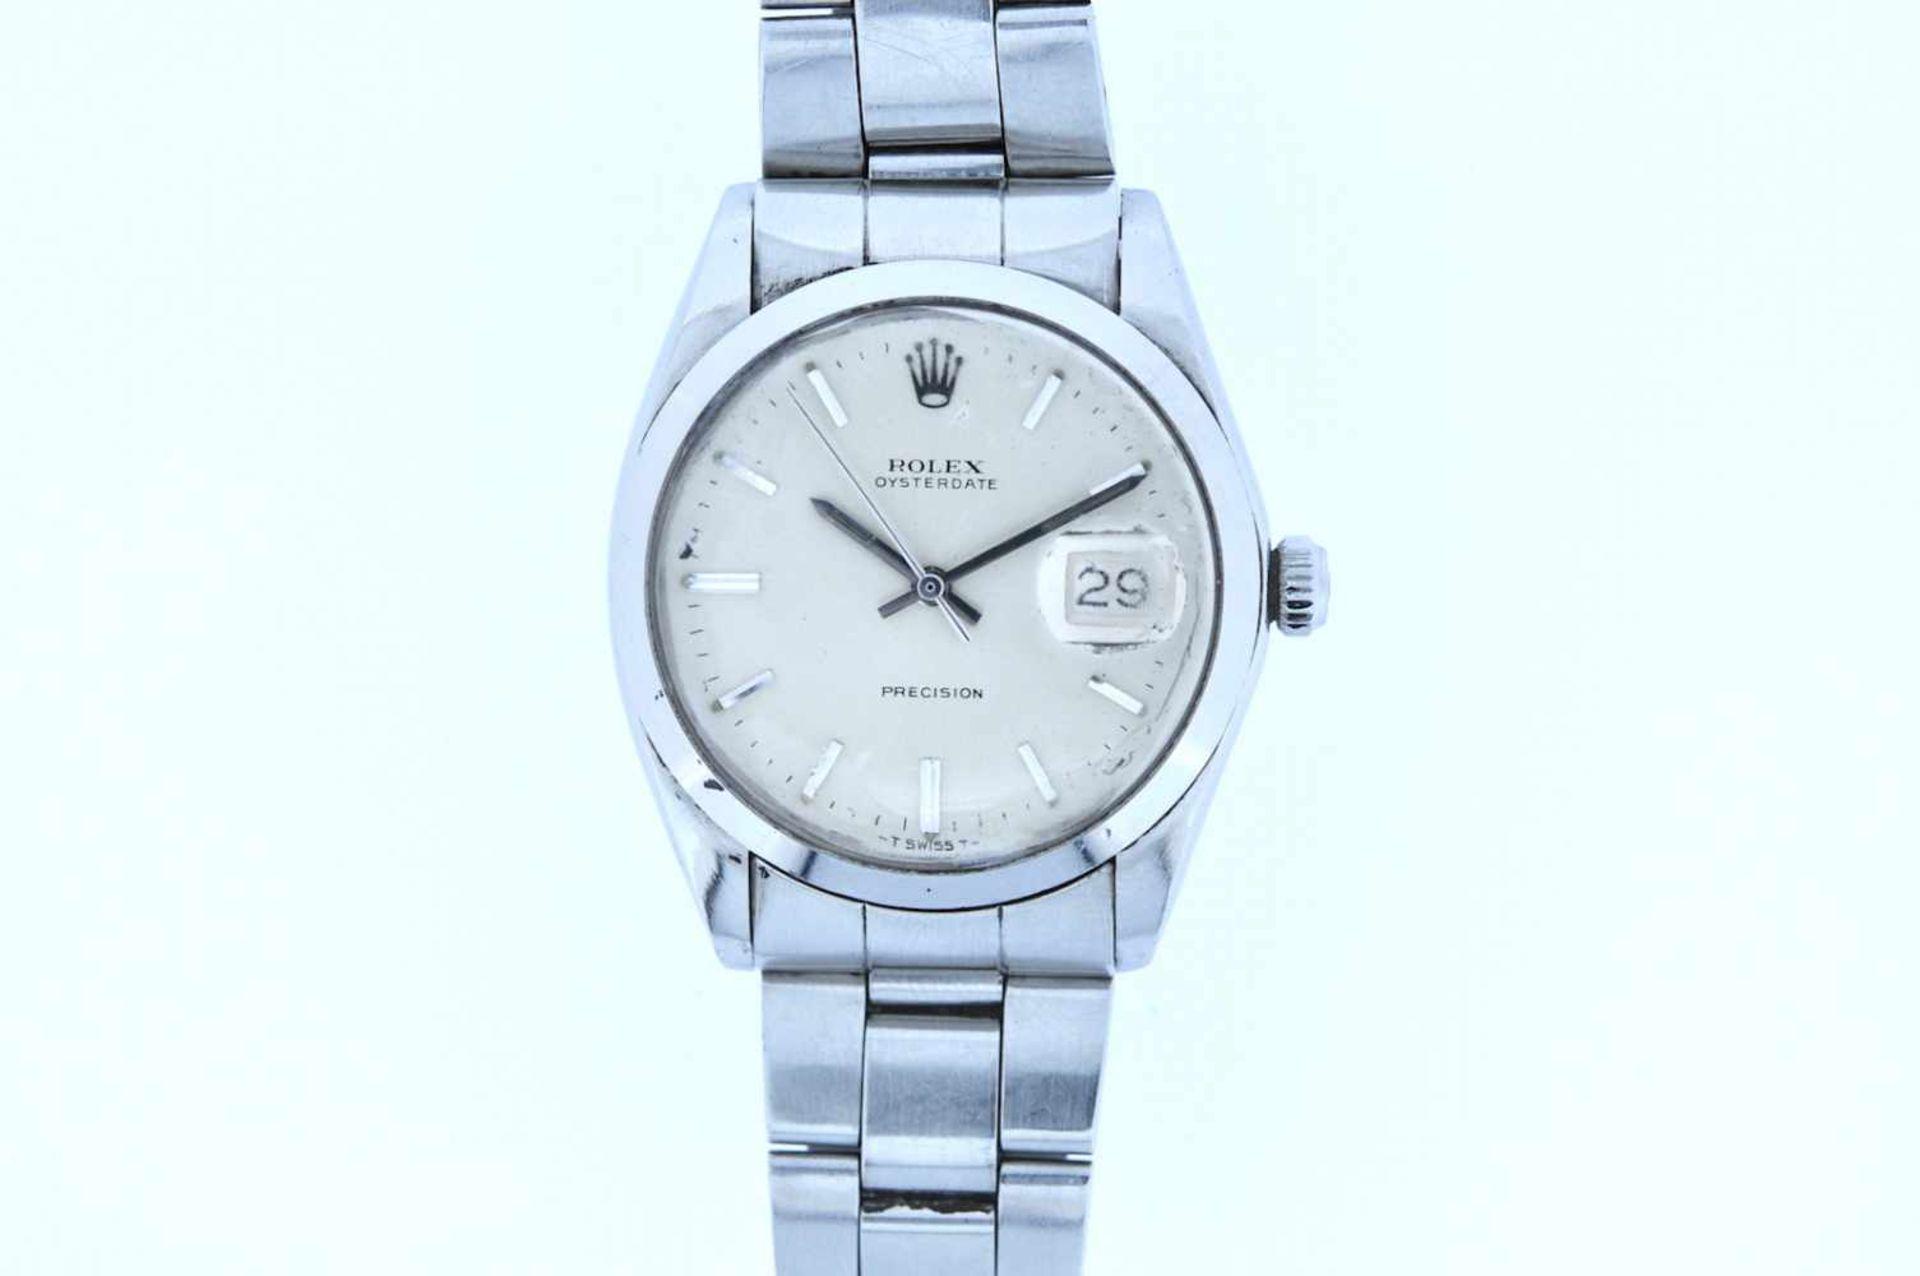 Los 6 - Rolex Rolex Date Precision, Ref.6694, Stahl/Stahl, Oysterband, Handaufzug, Plexiglas, Glas stark